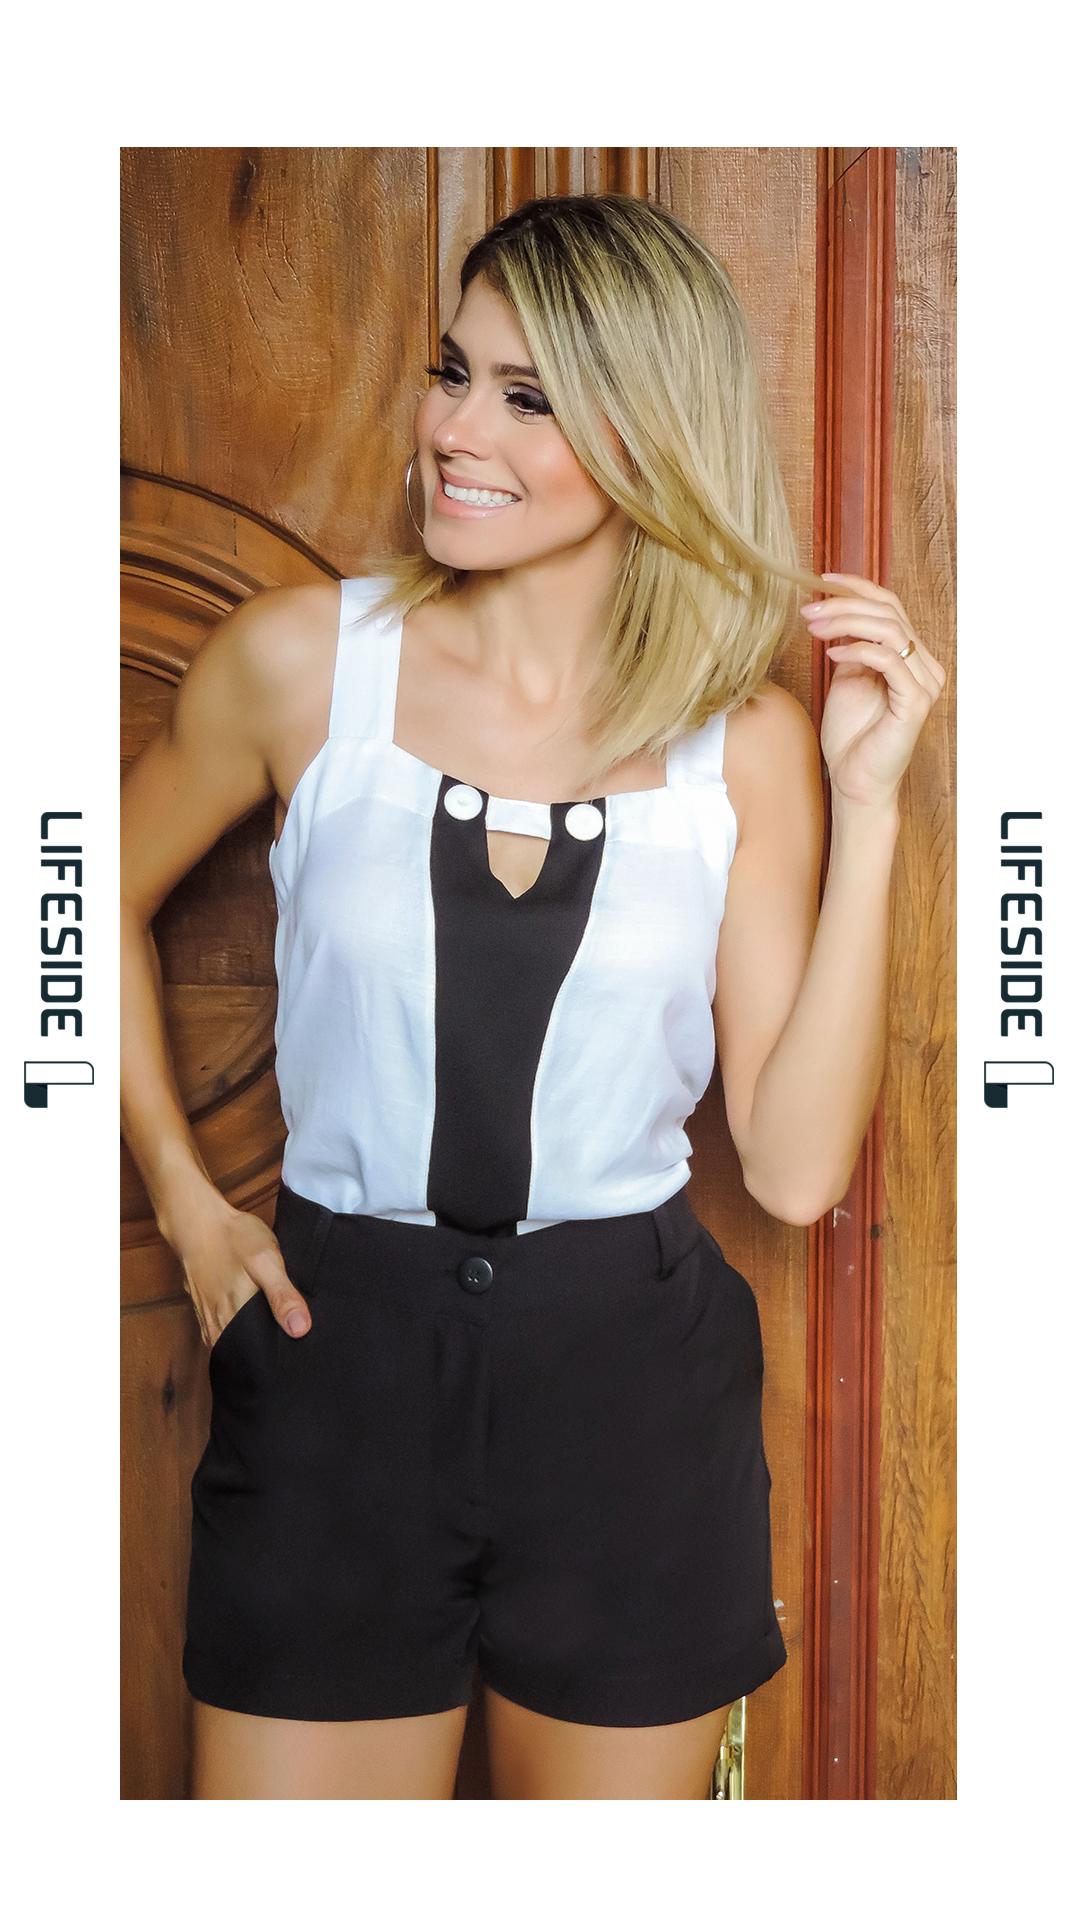 e3bc4ebe6 Blusa preto e branco. Blusa de verão. #ModaFeminina #LookDoDia #Looks  #ModaPrimaveraVerao #Lifeside #Lookbook #Moda #Fashion #OOTD  #SpringSummer2019 #Look ...